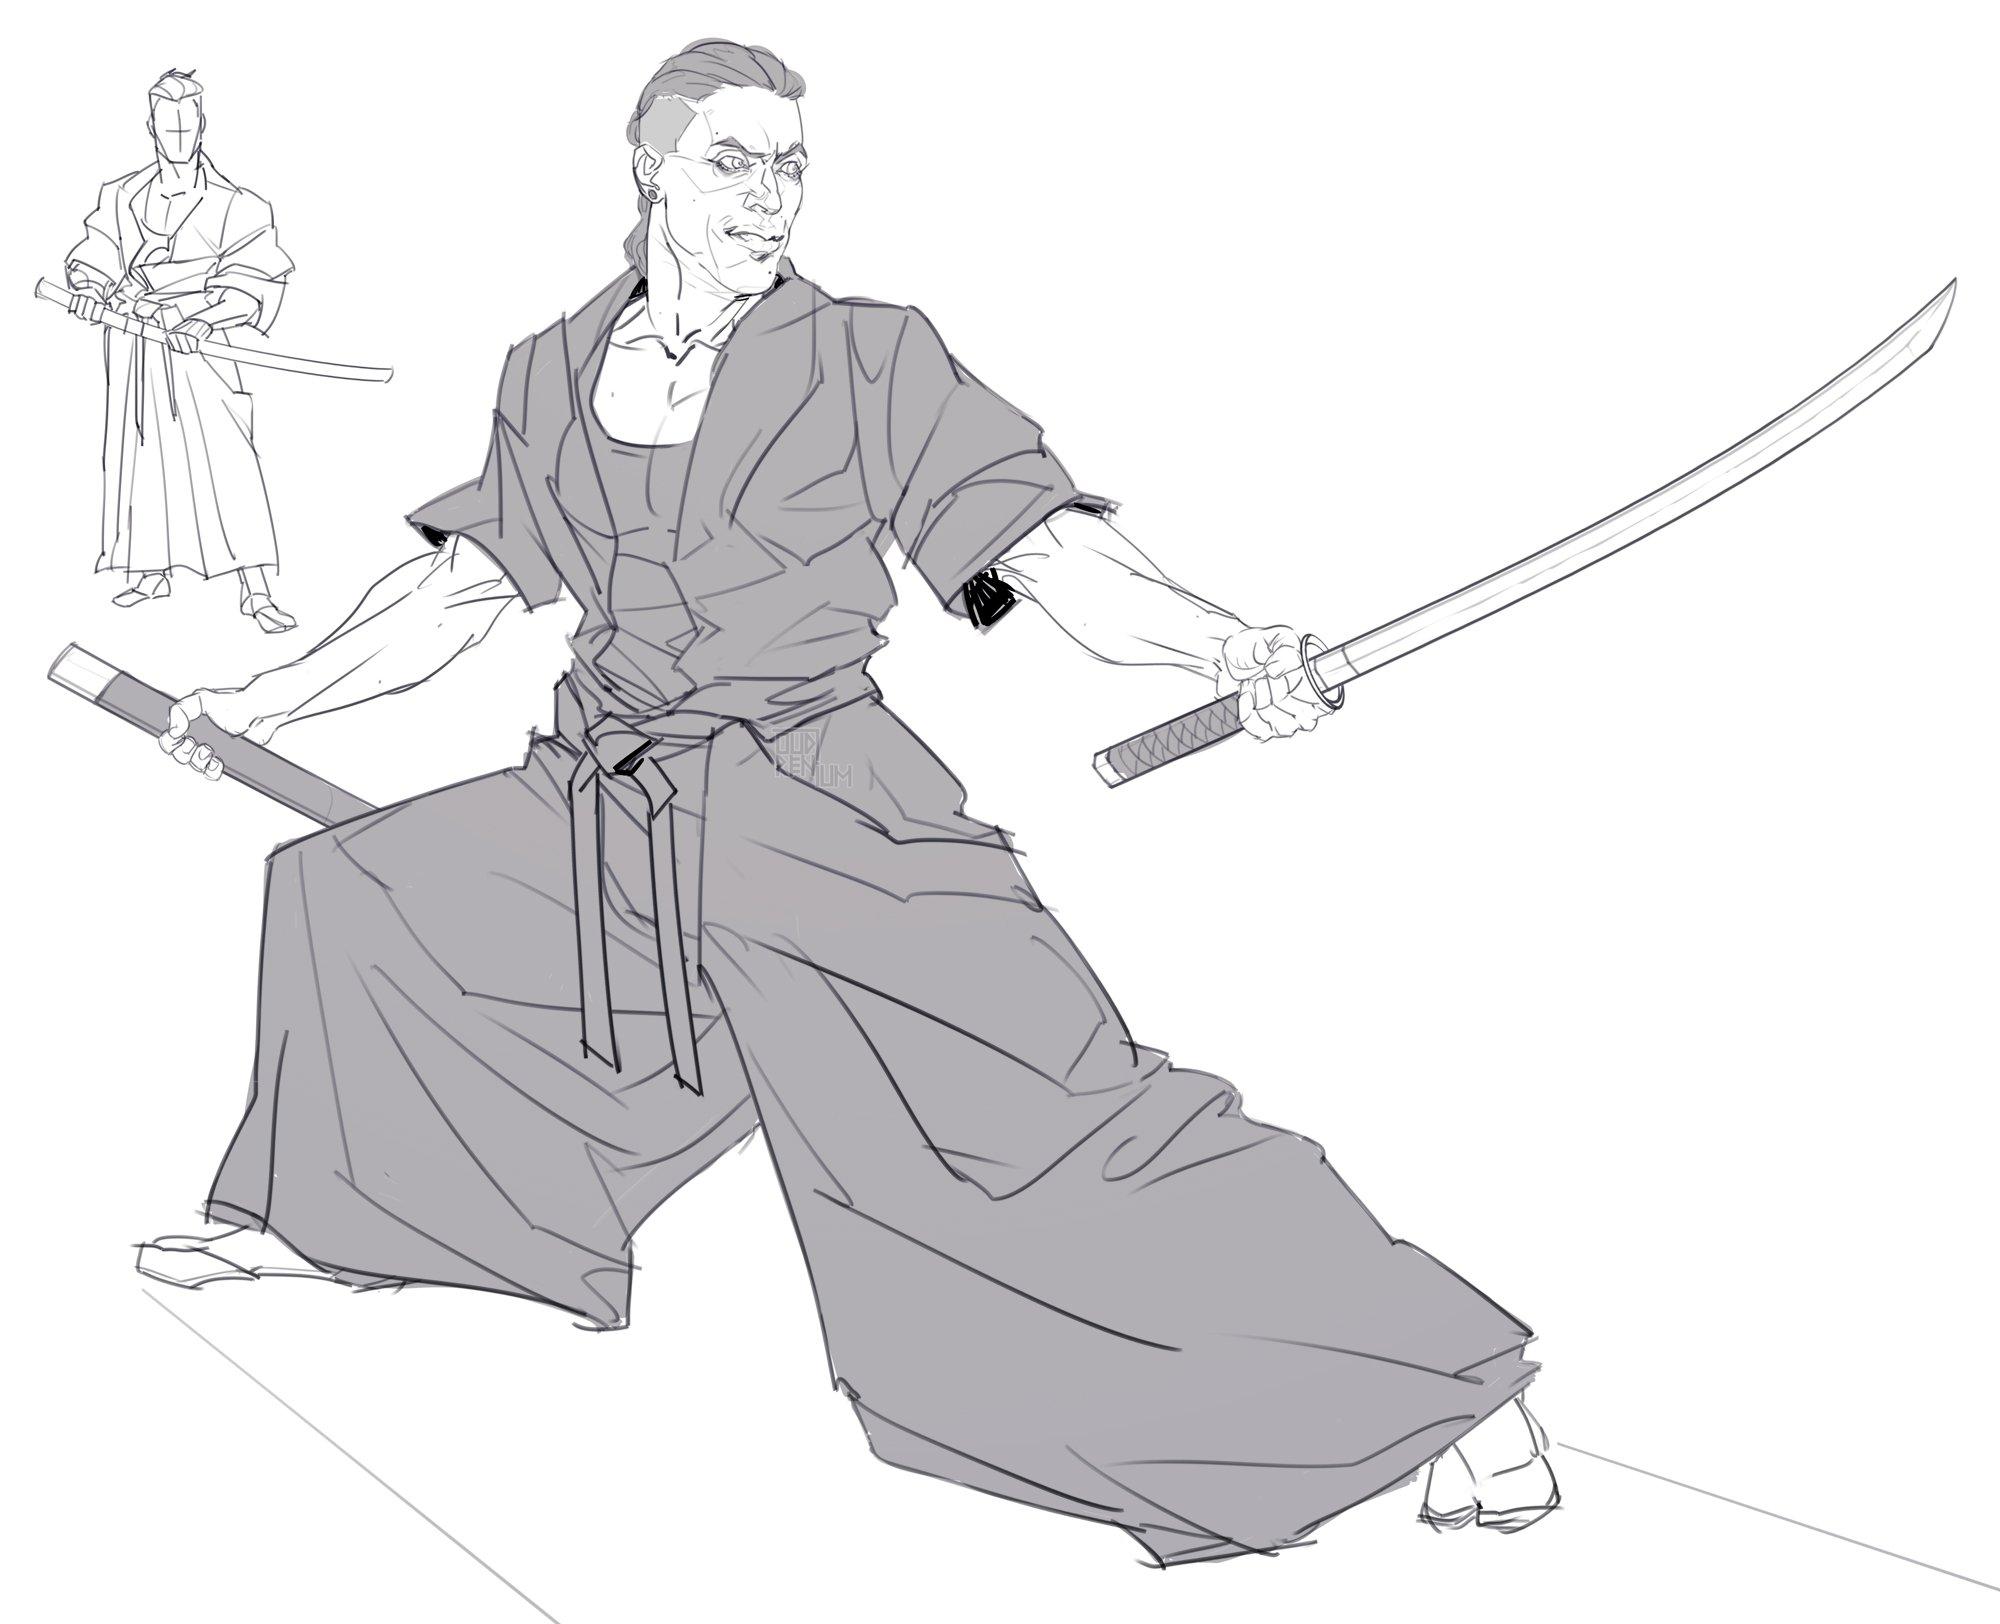 Samurai juicy m ton dyson samurai dyson v8 цена в москве